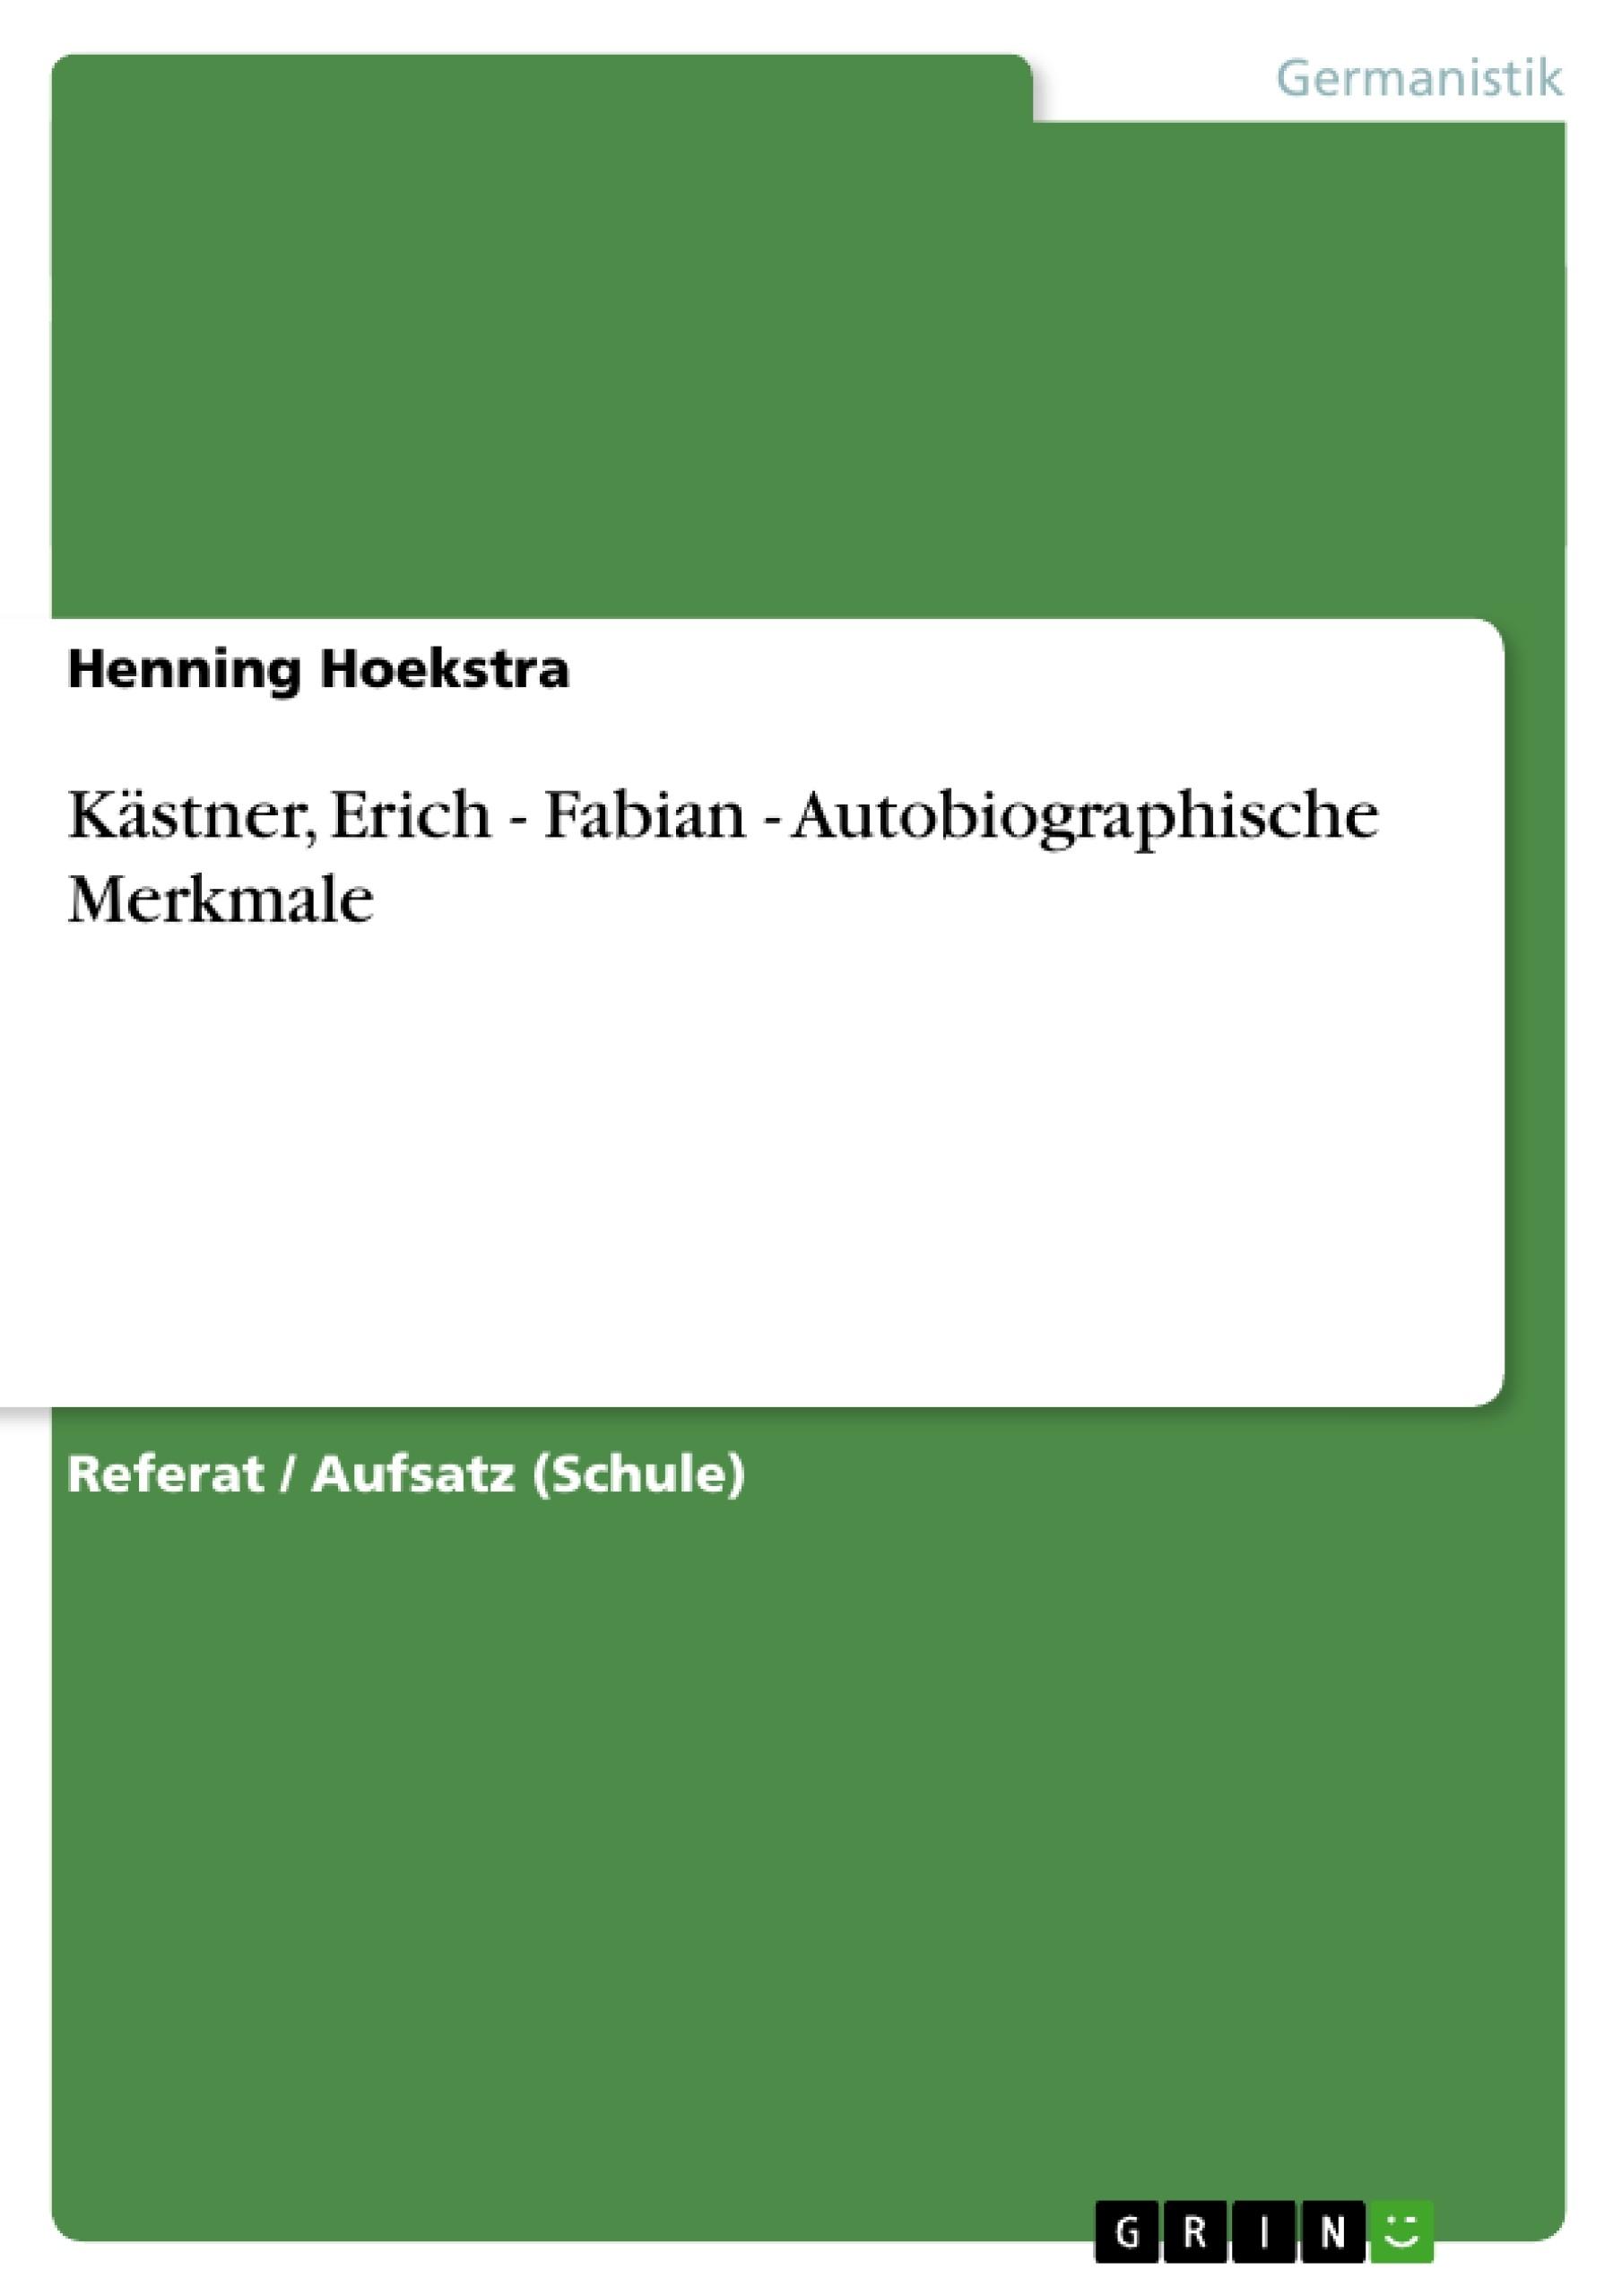 Titel: Kästner, Erich - Fabian - Autobiographische Merkmale